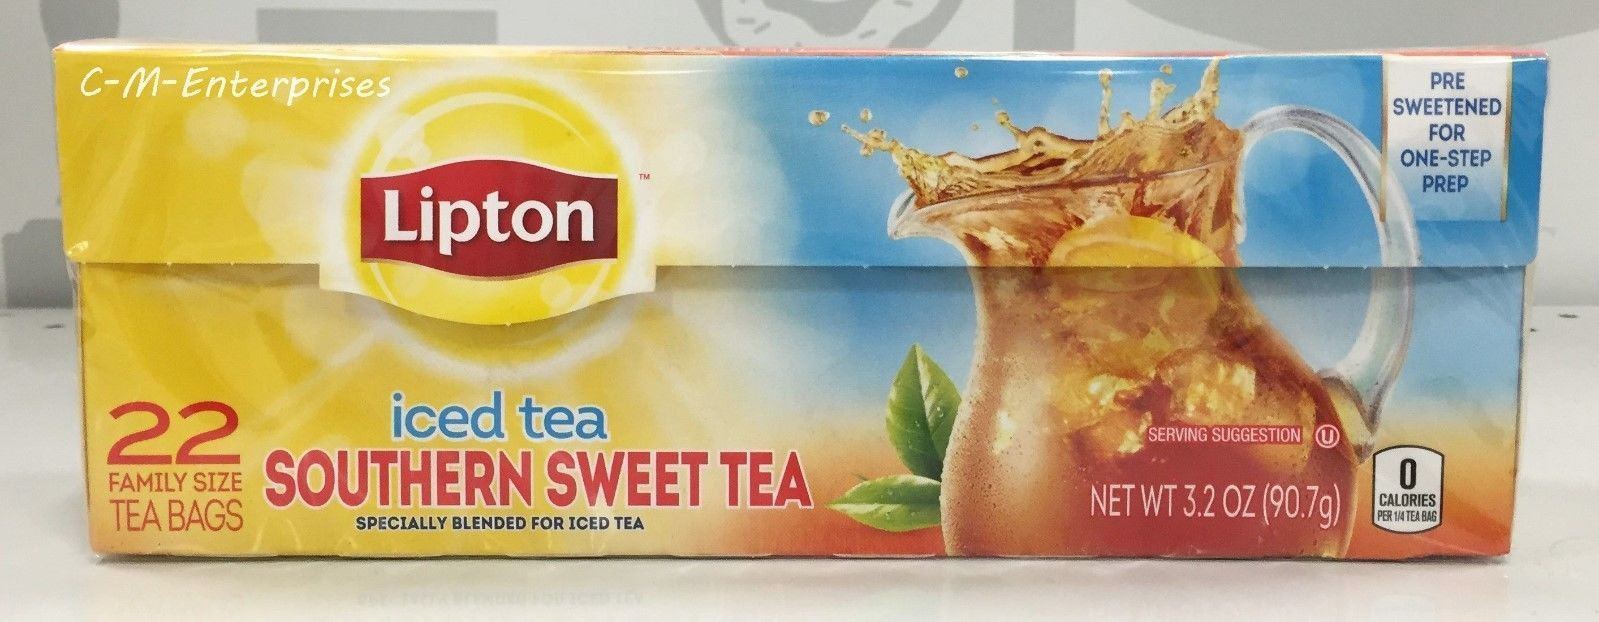 Lipton Iced Tea Southern Sweet Bags 22 Ct 3 2 Oz